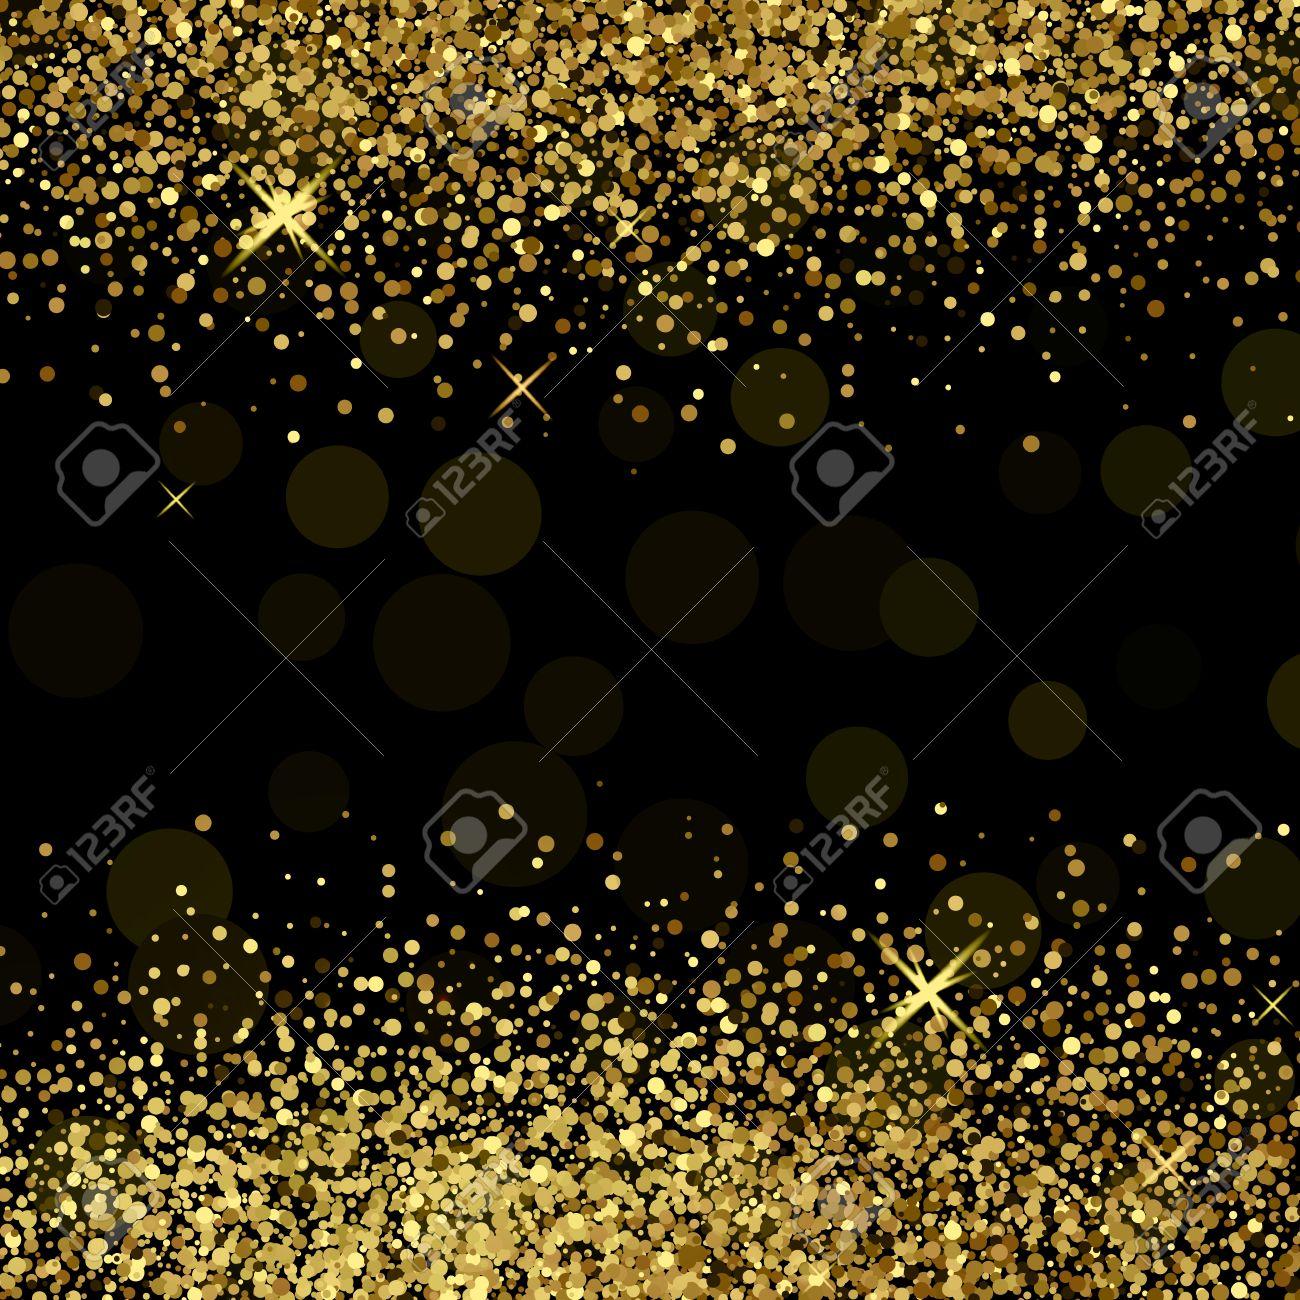 Shiny golden glitter on black background - 50743681